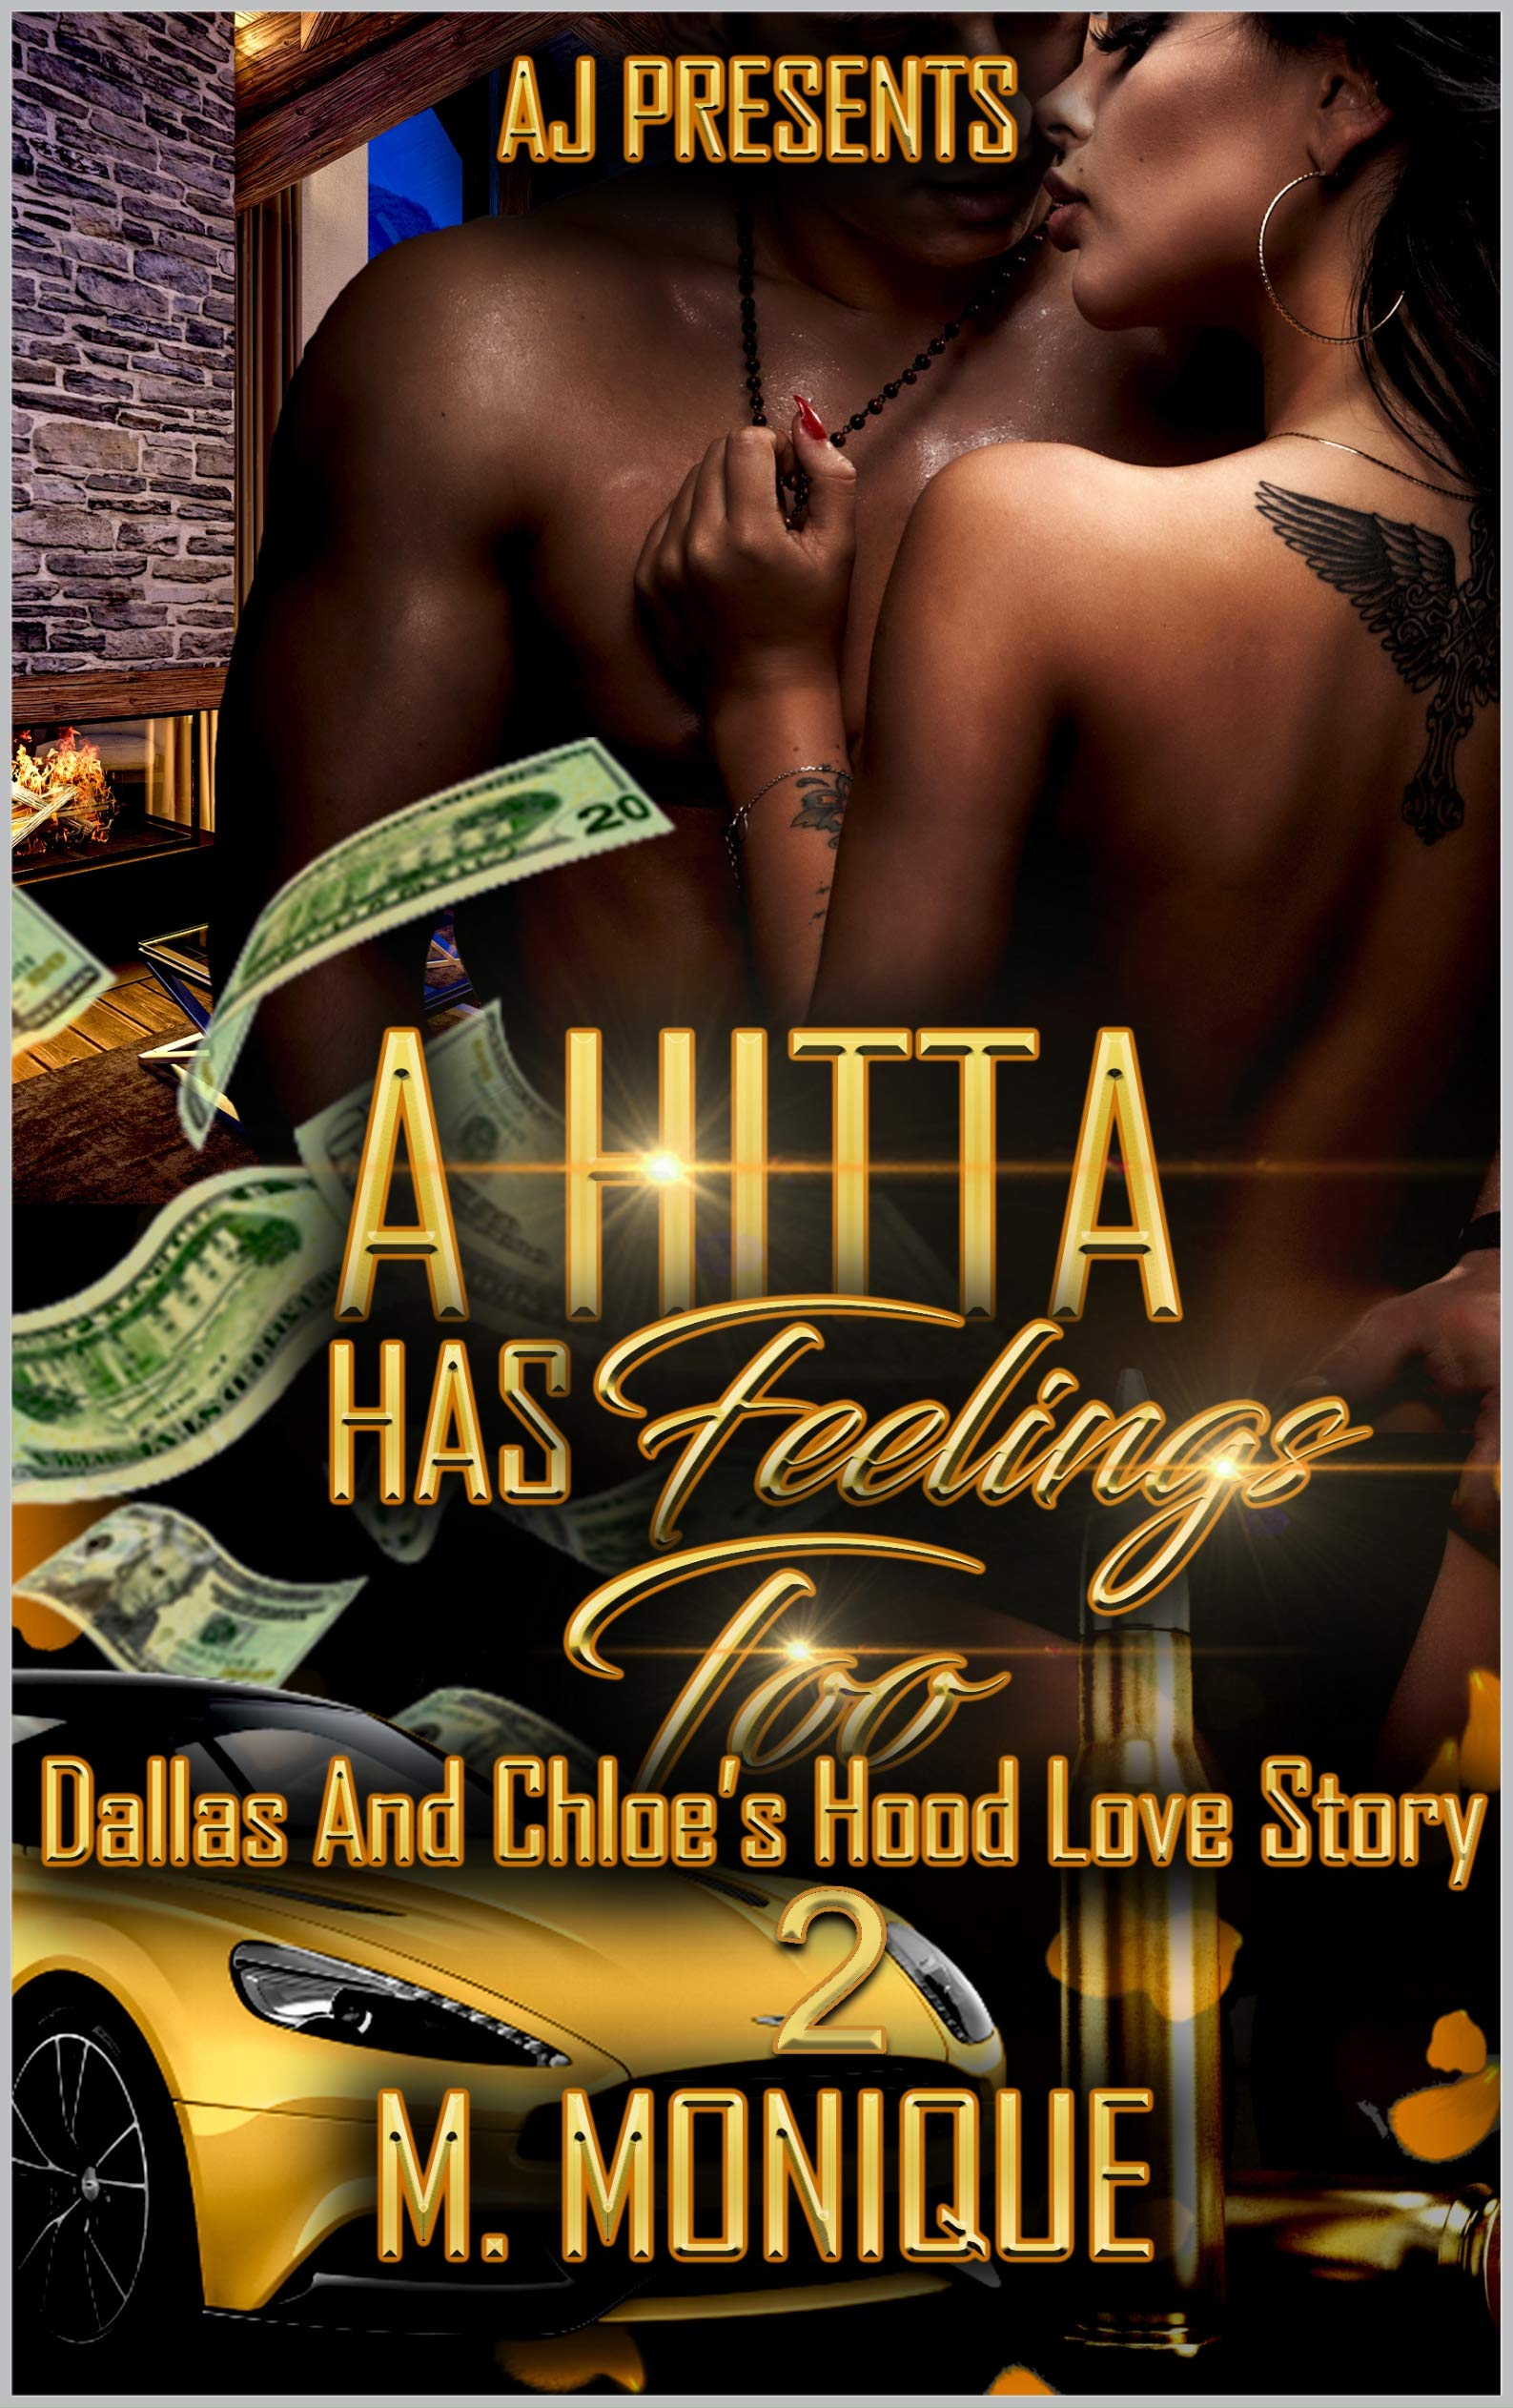 A Hitta has Feelings too: Dallas and Chloe's Hood Love Story 2